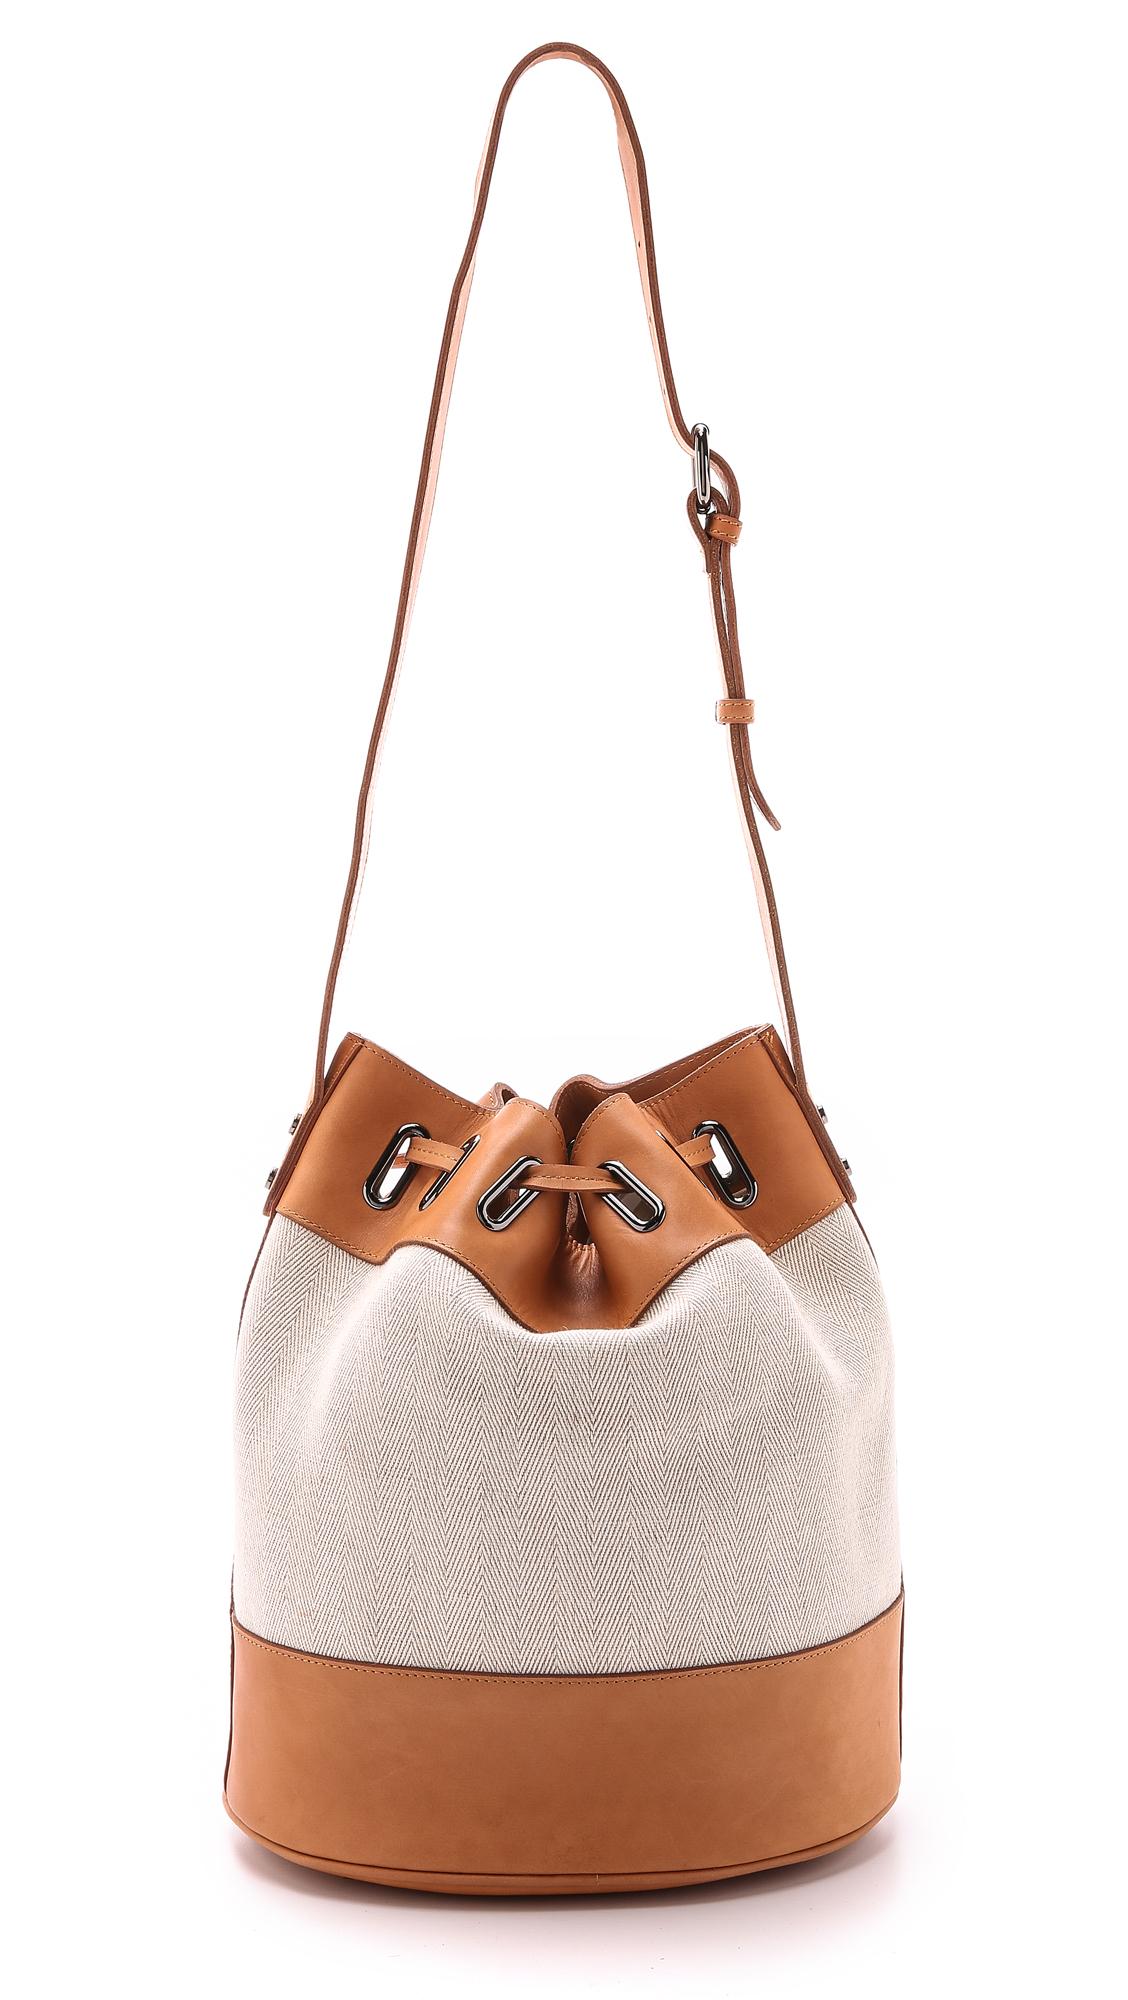 Zimmermann Drawstring Beach Bucket Bag - Tan in Brown | Lyst